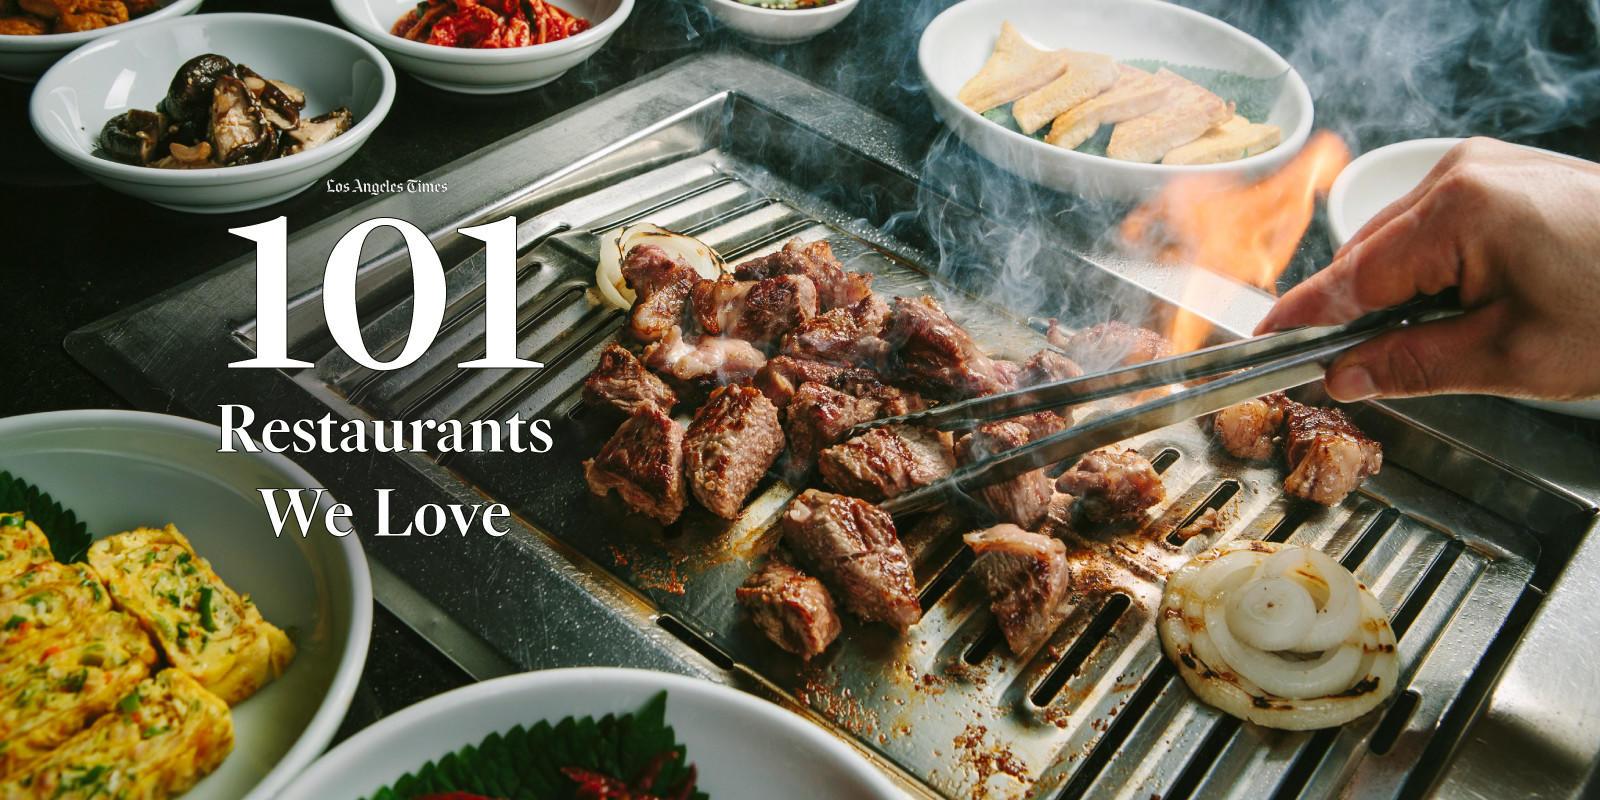 101 Restaurants We Love - Los Angeles Times